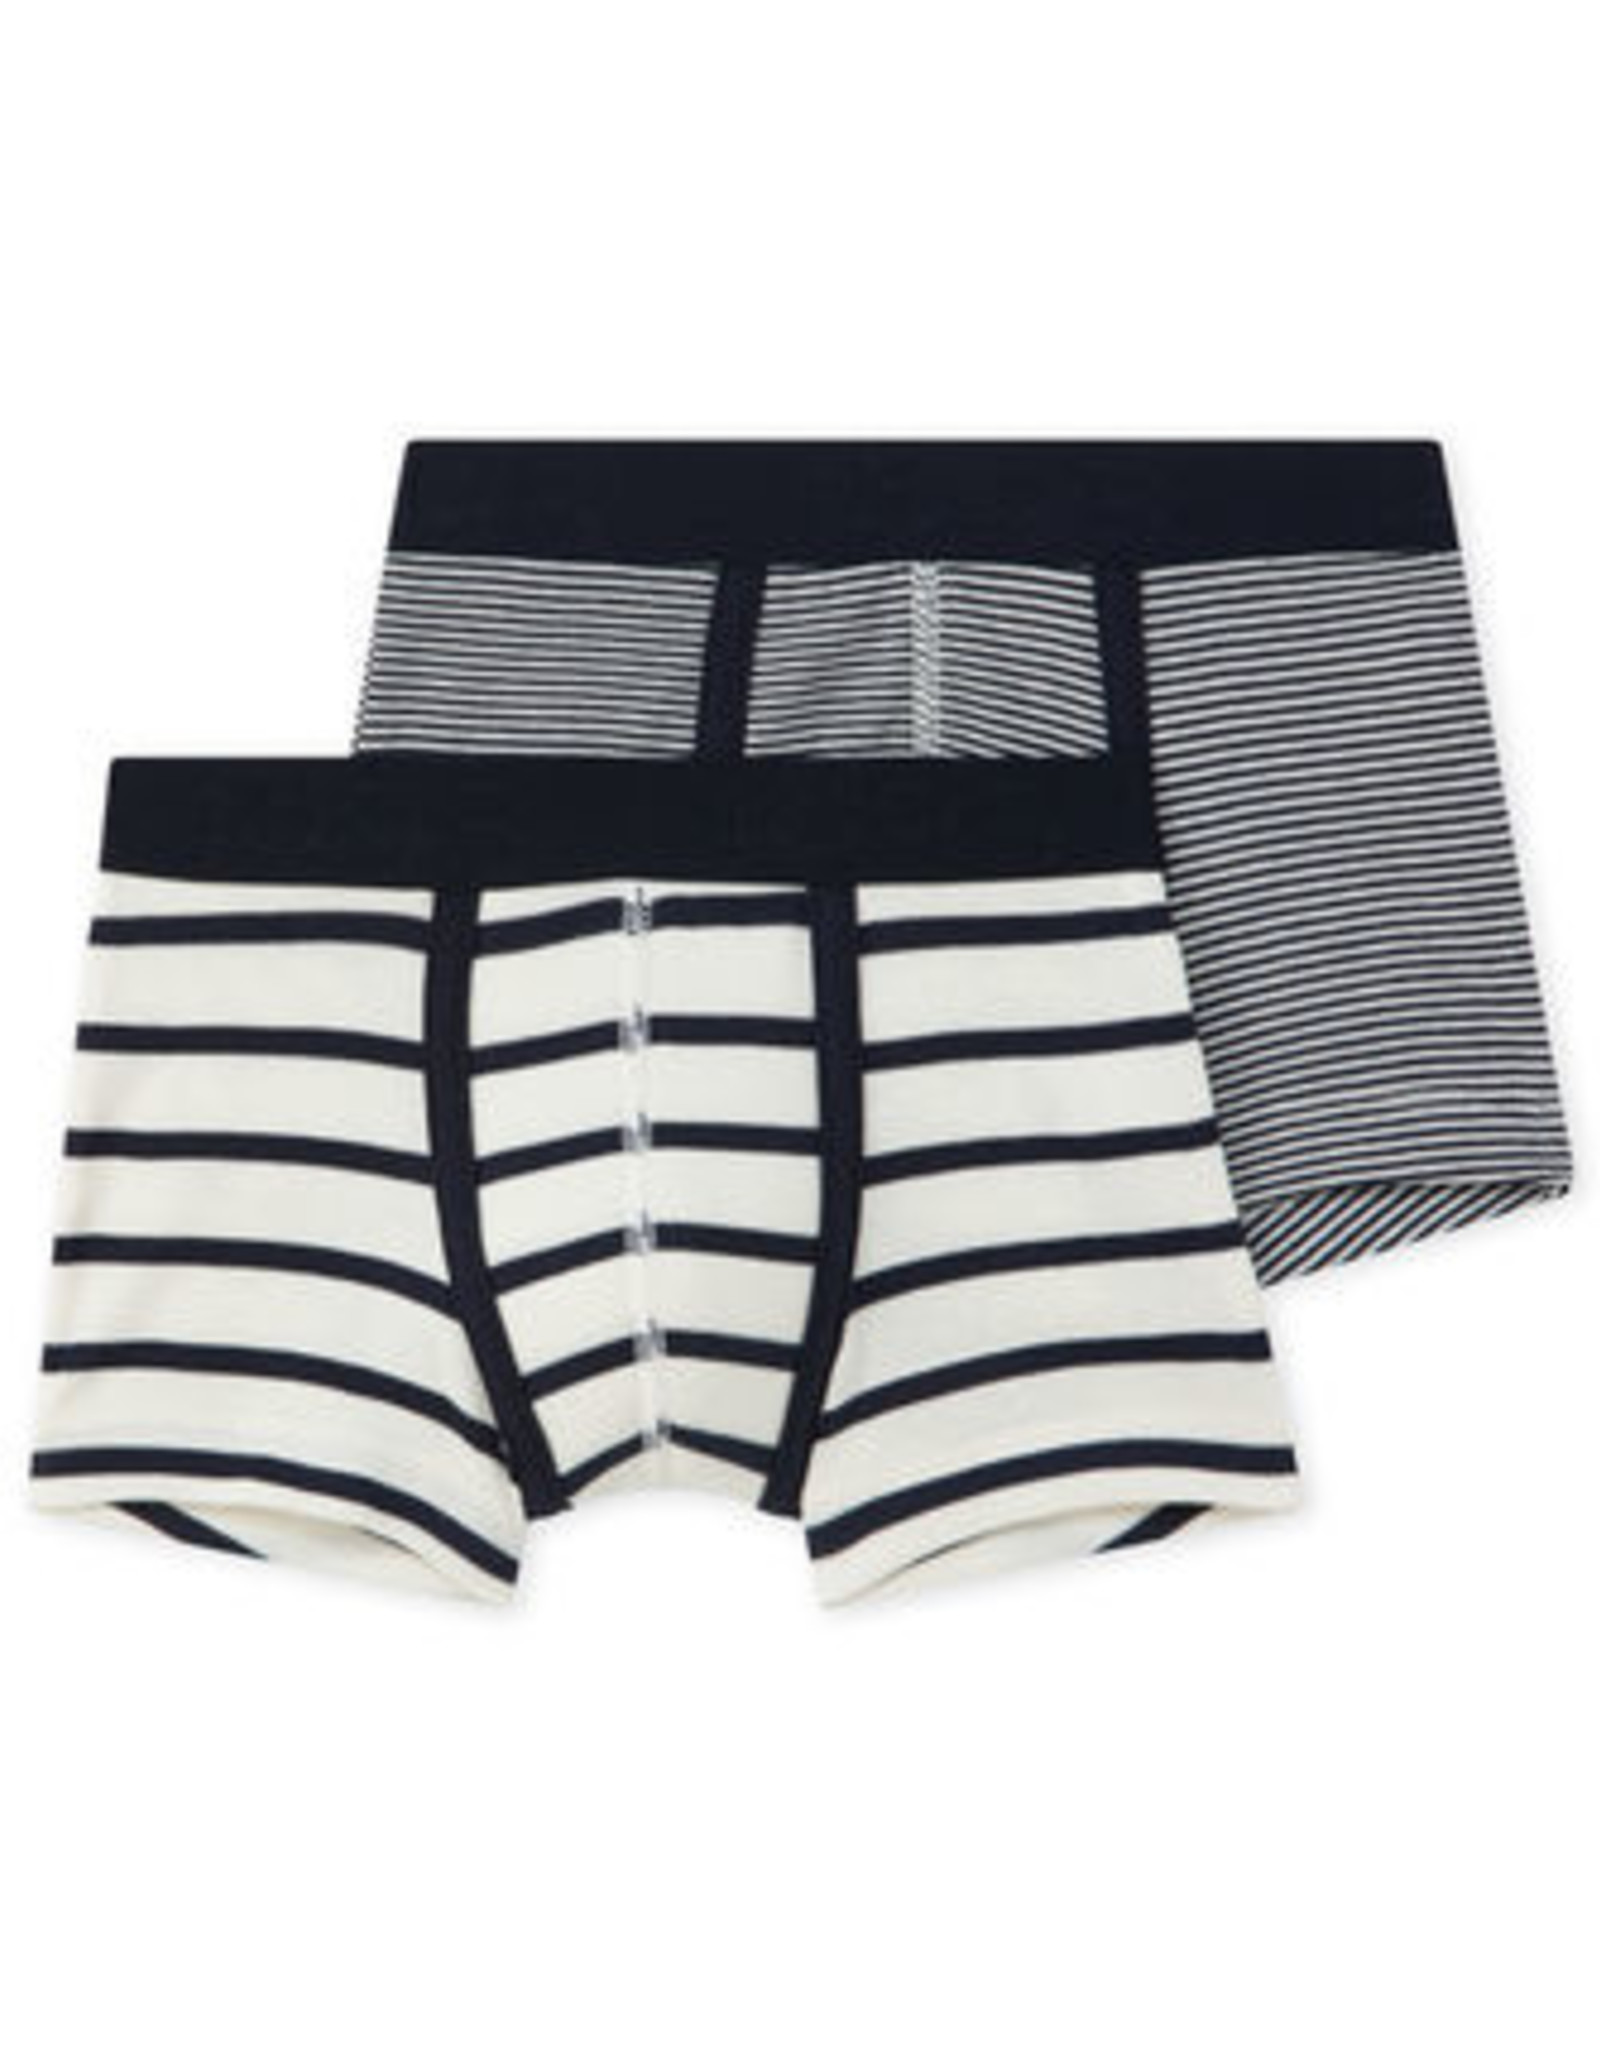 Petit Bateau Set of 2 striped boxers